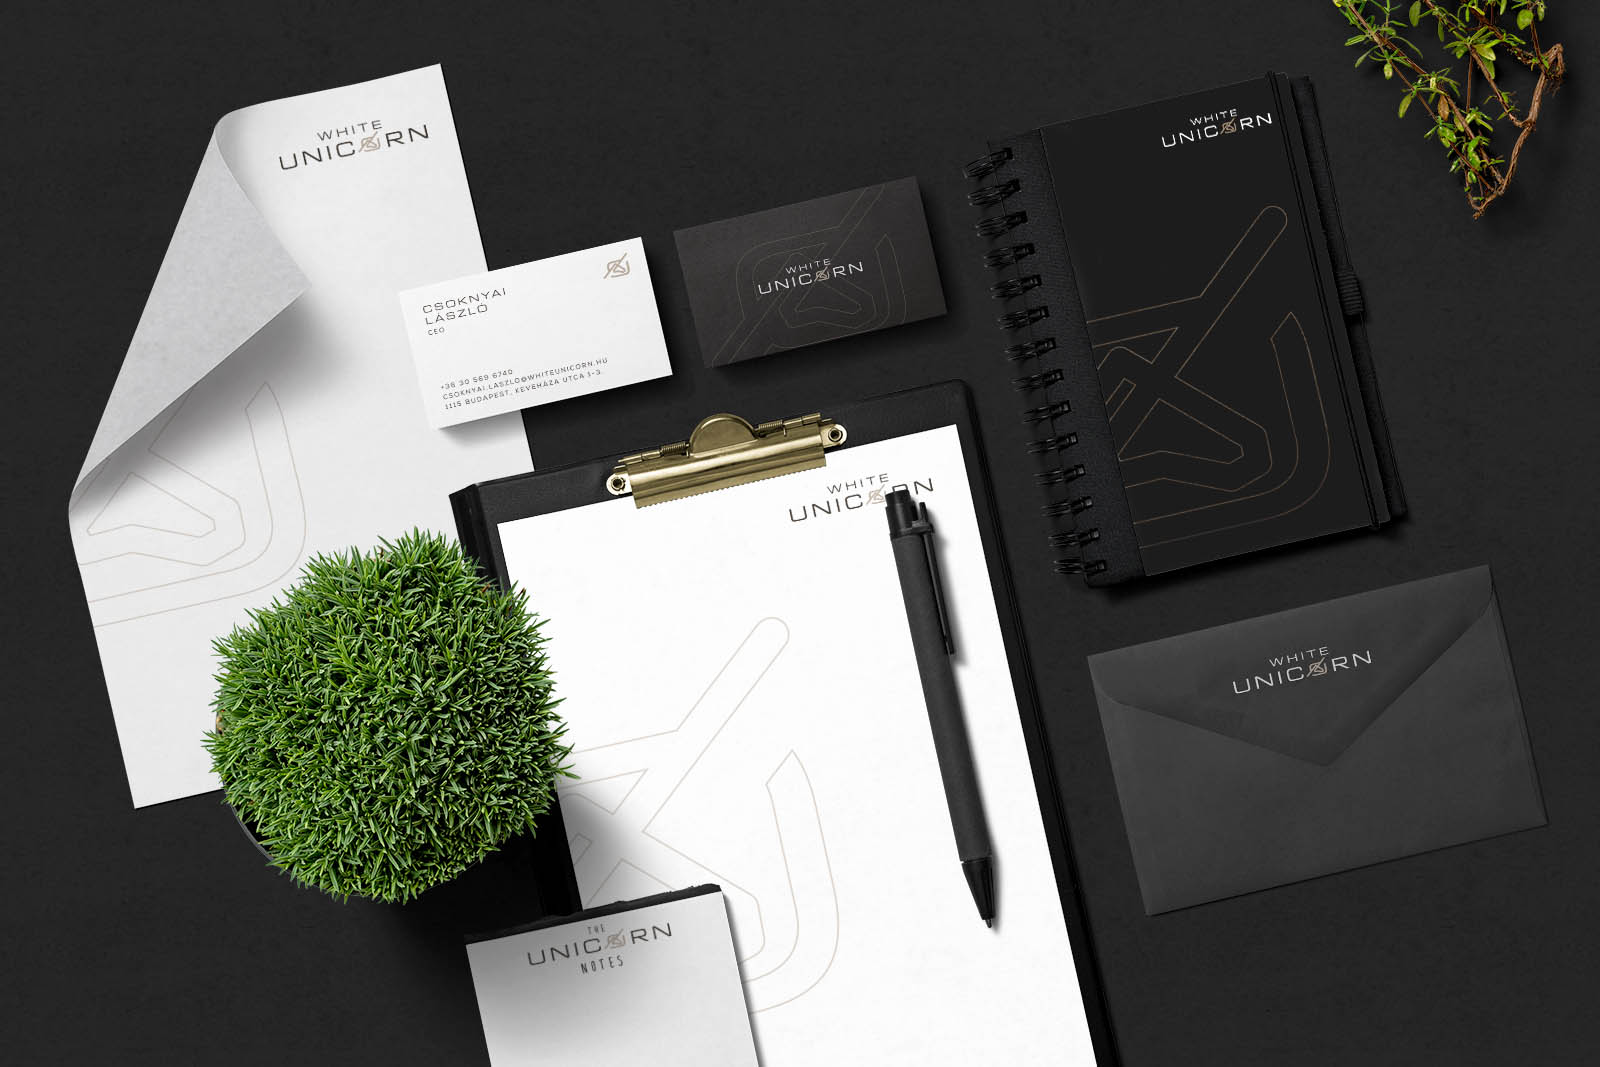 branding startup design arculattervezés